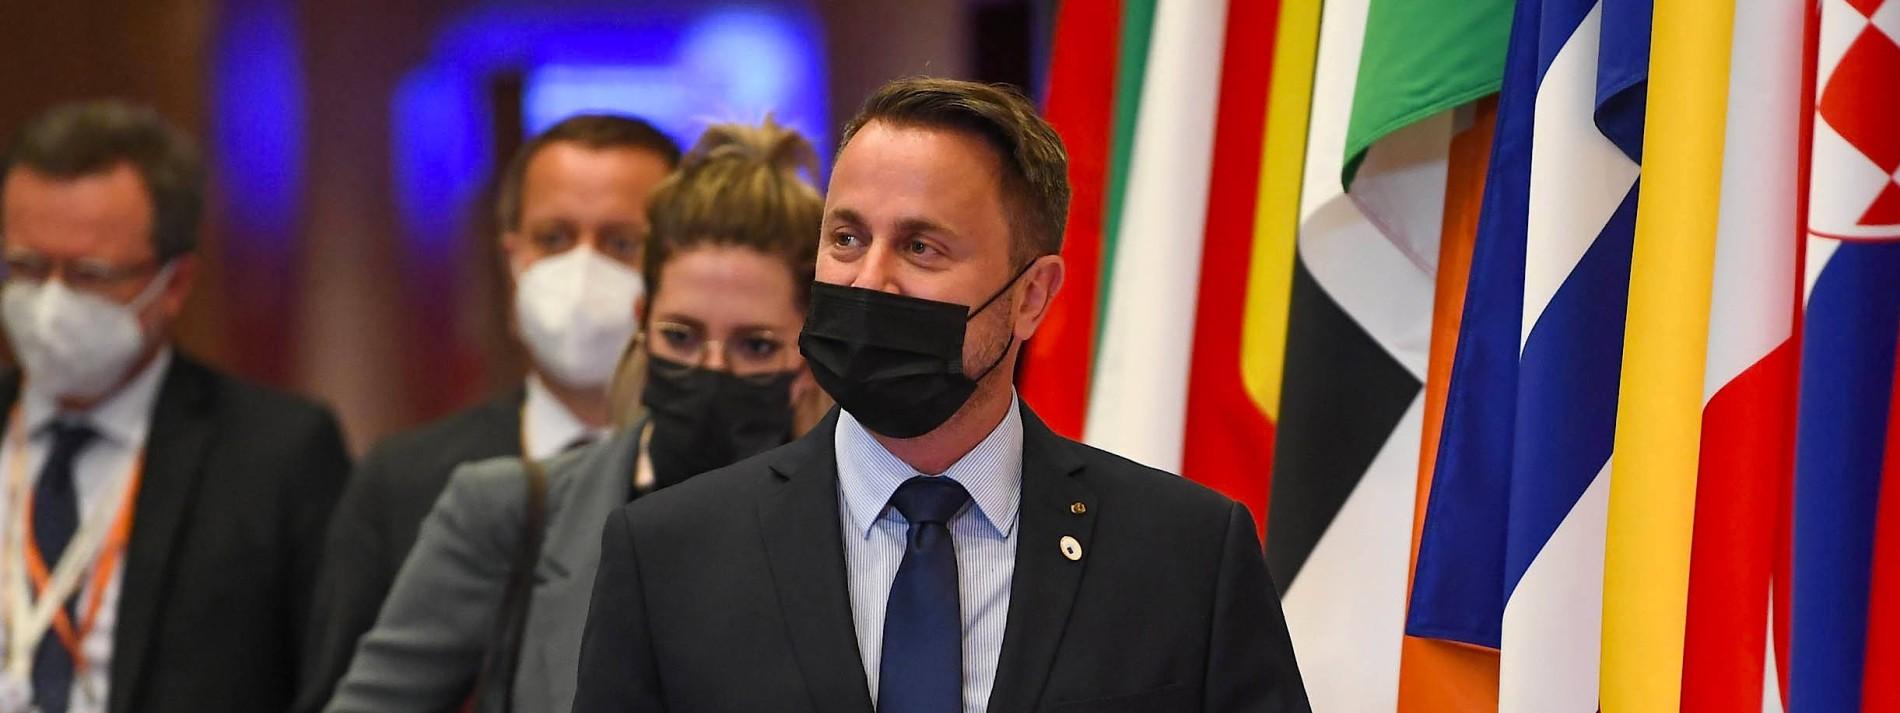 Luxemburgs Premierminister nach EU-Gipfel positiv auf Corona getestet